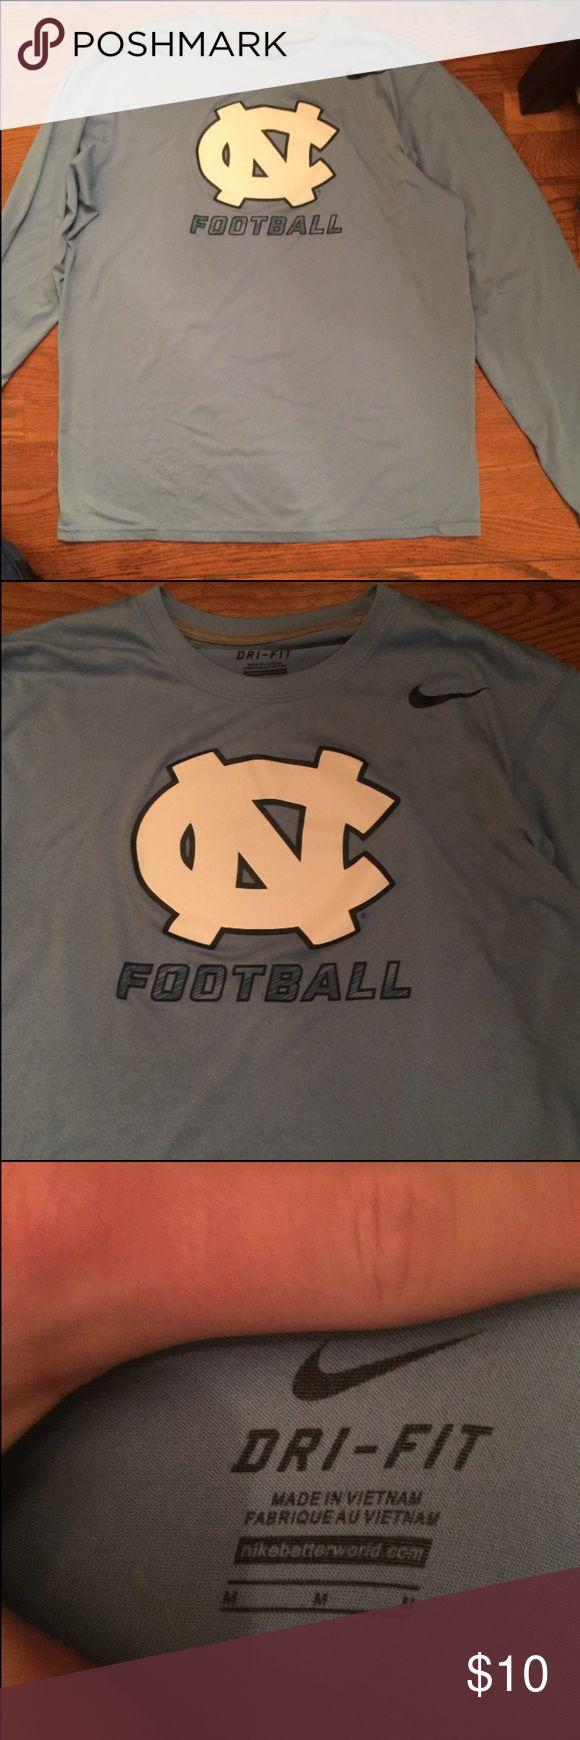 Nike Dri-Fit North Carolina long sleeve T-Shirt Nike Dri-Fit North Carolina long sleeve T-Shirt  Size: Medium  Team: North Carolina (UNC) Nike Shirts Tees - Long Sleeve